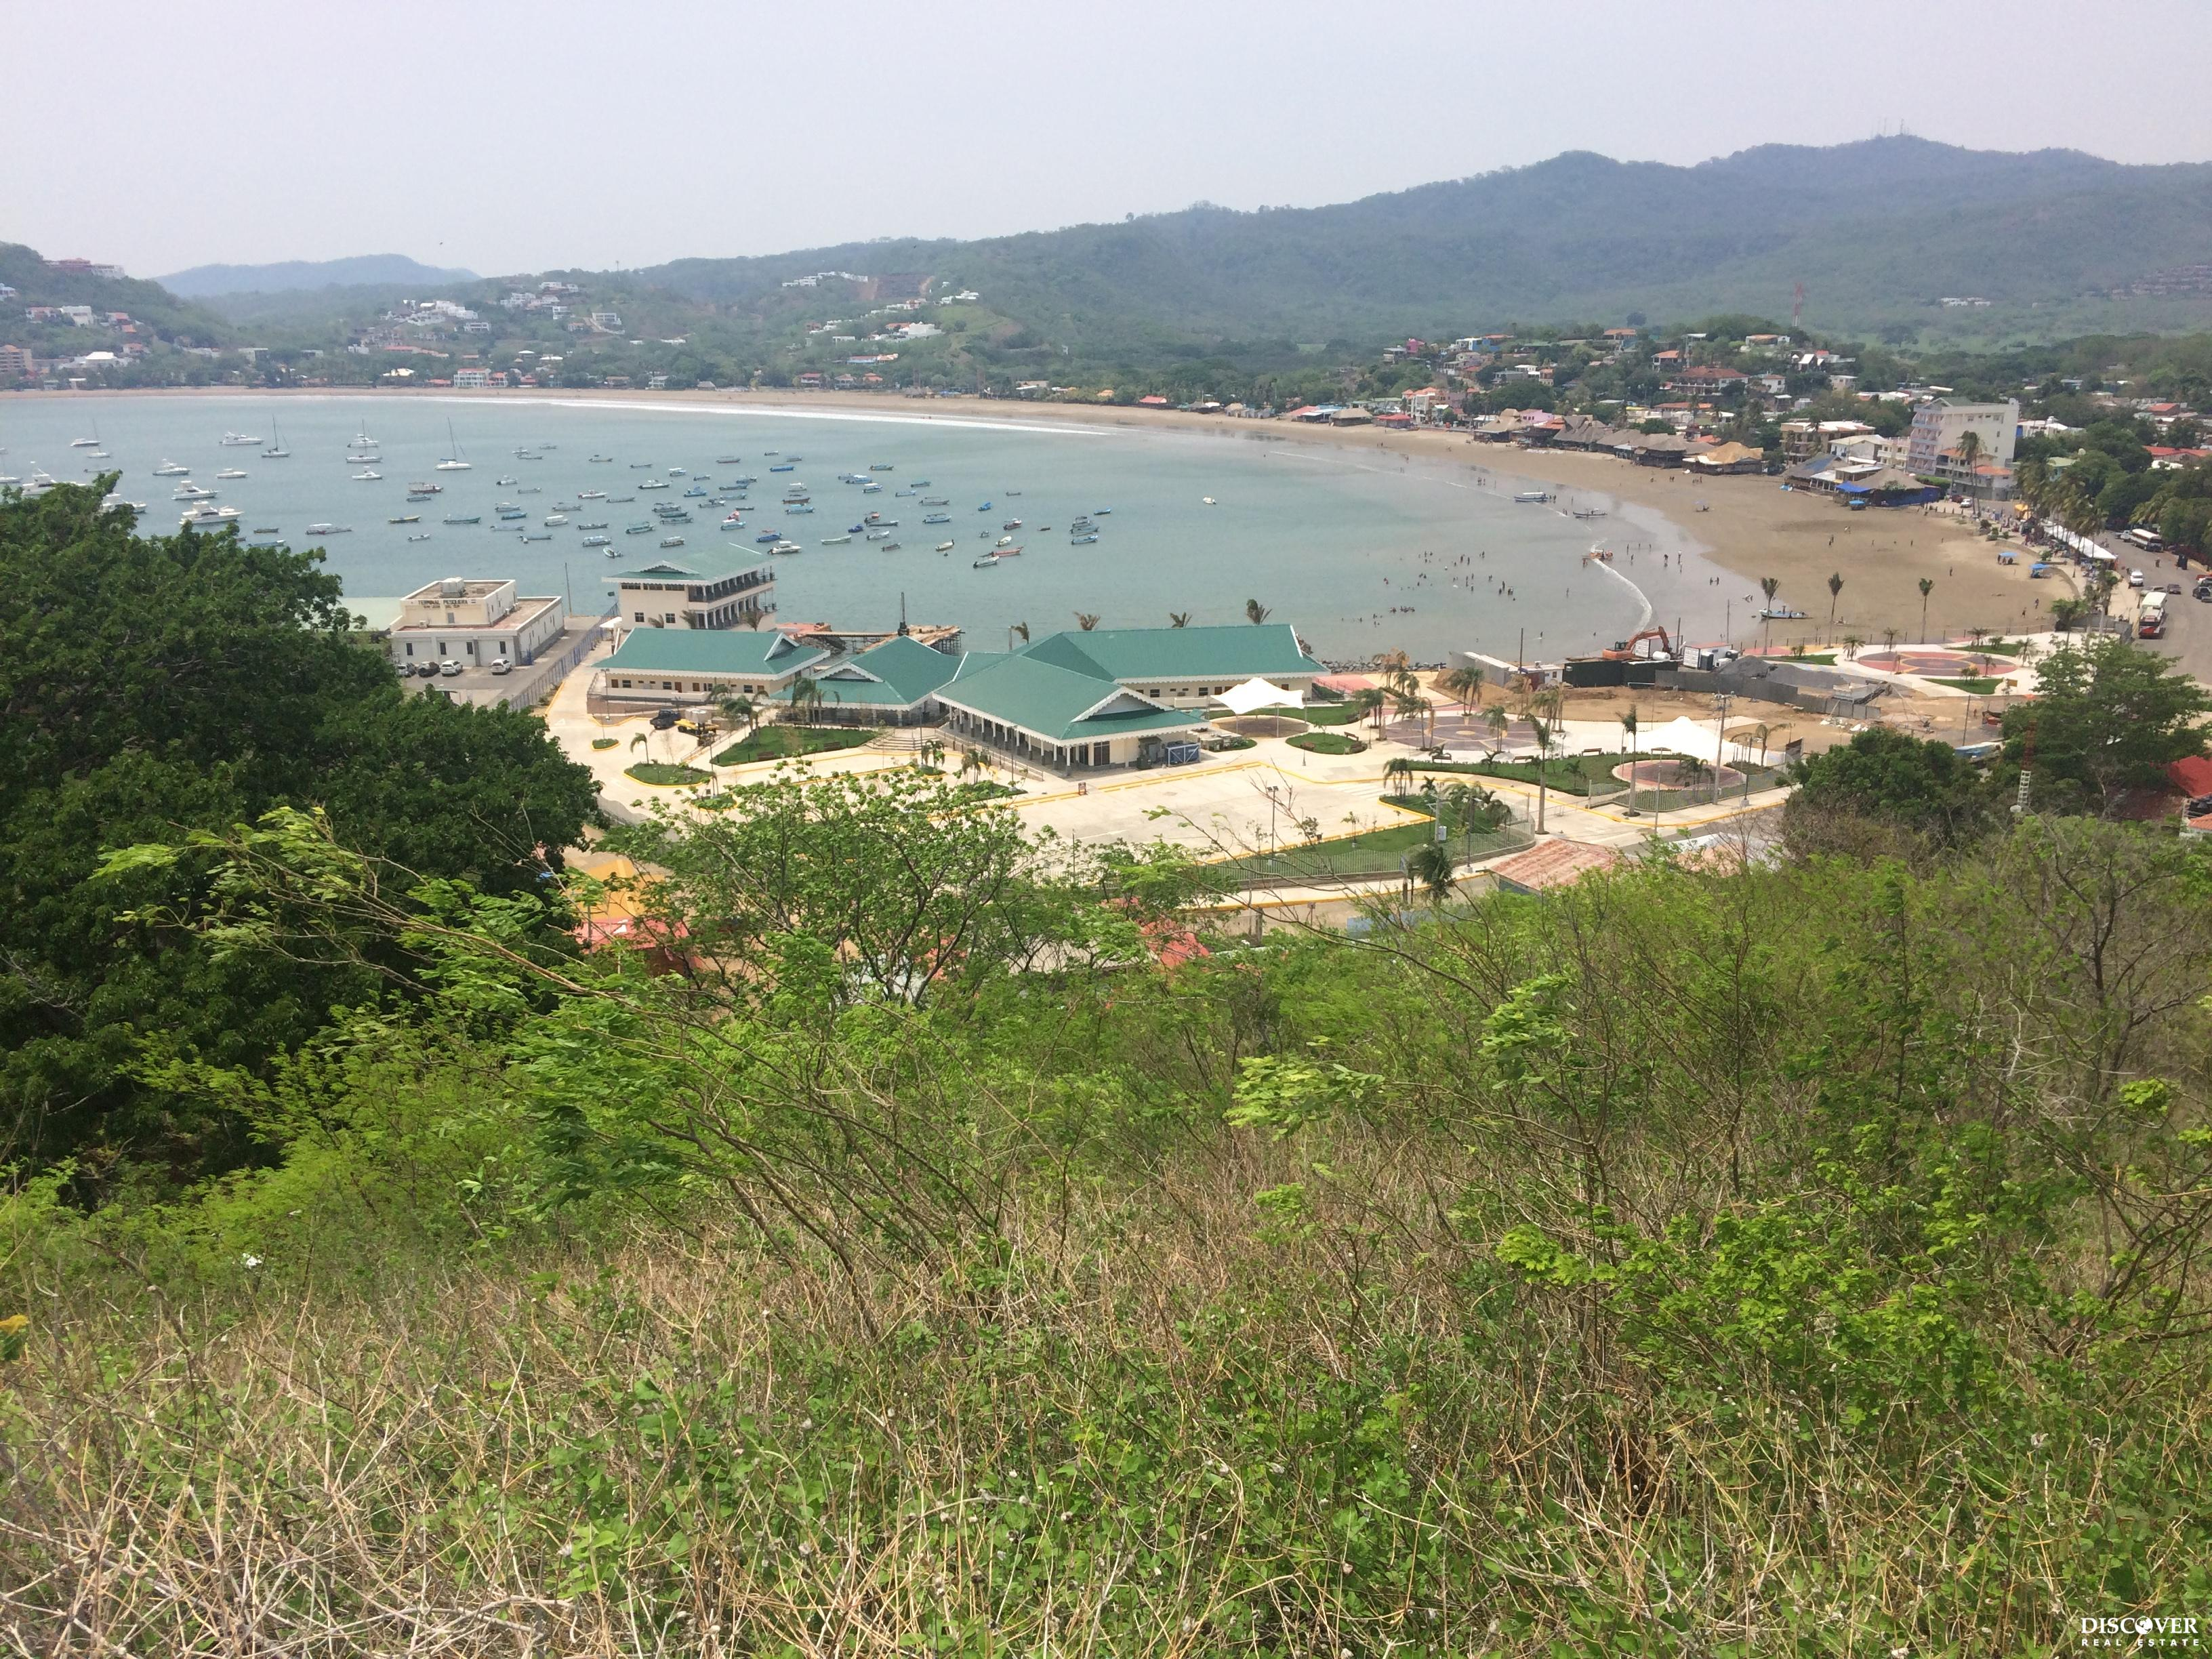 Development Lot Above the Port Area